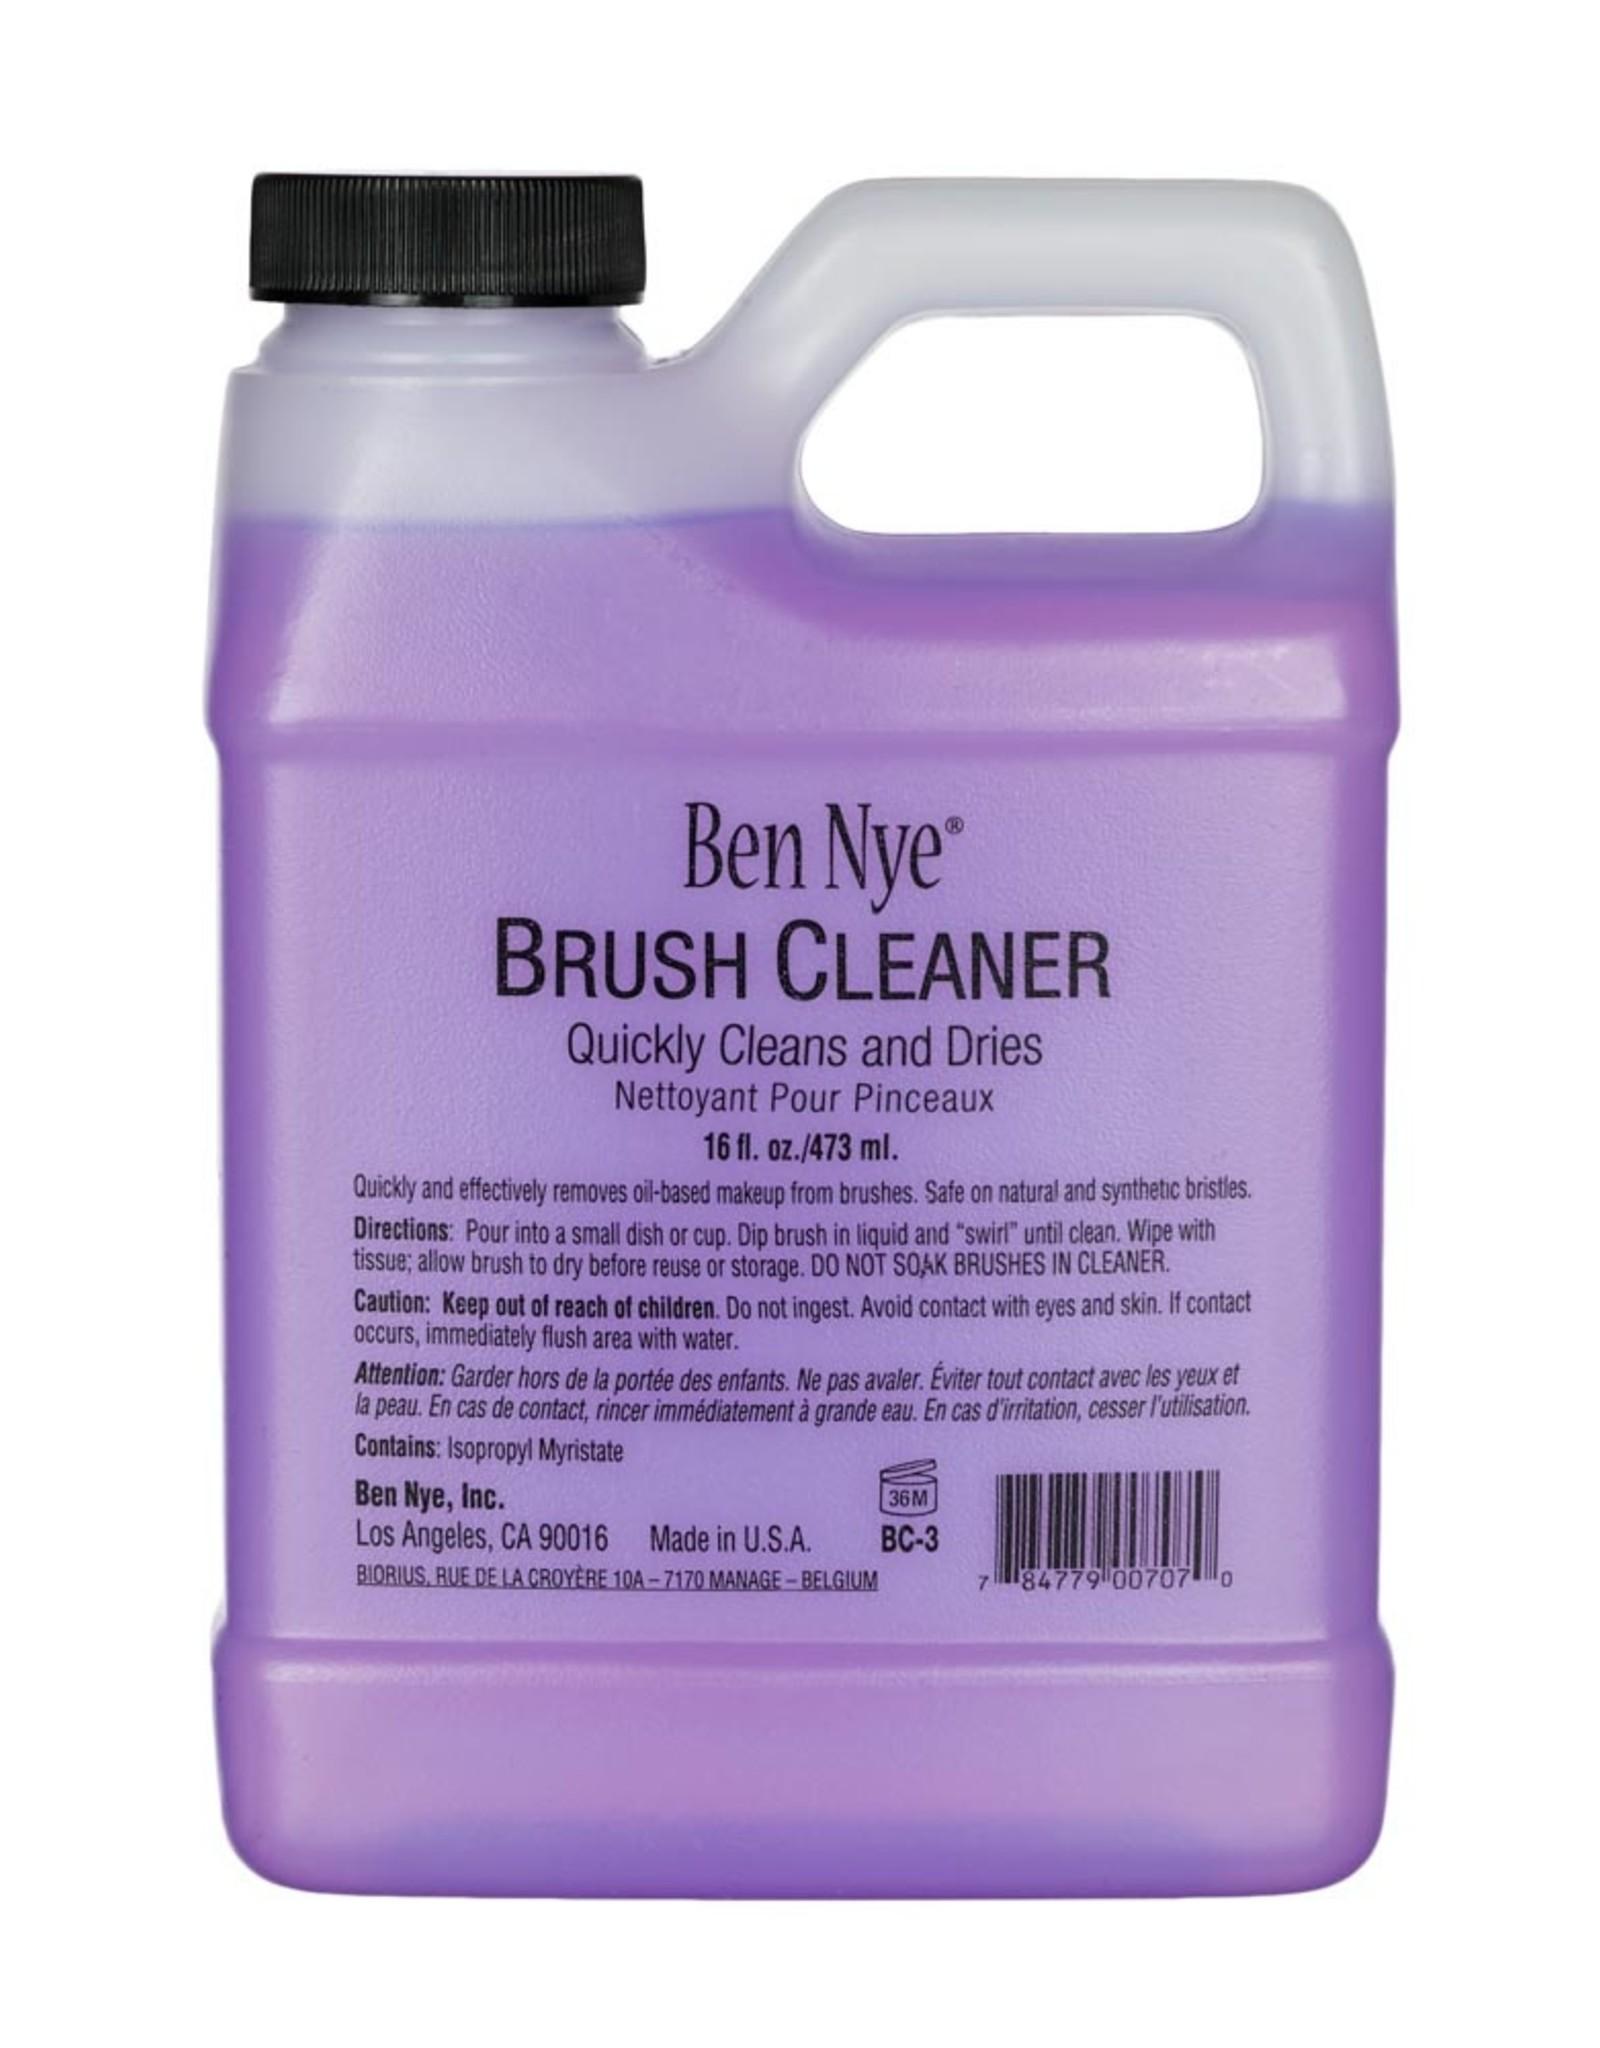 Ben Nye BRUSH CLEANER, 16 FL OZ